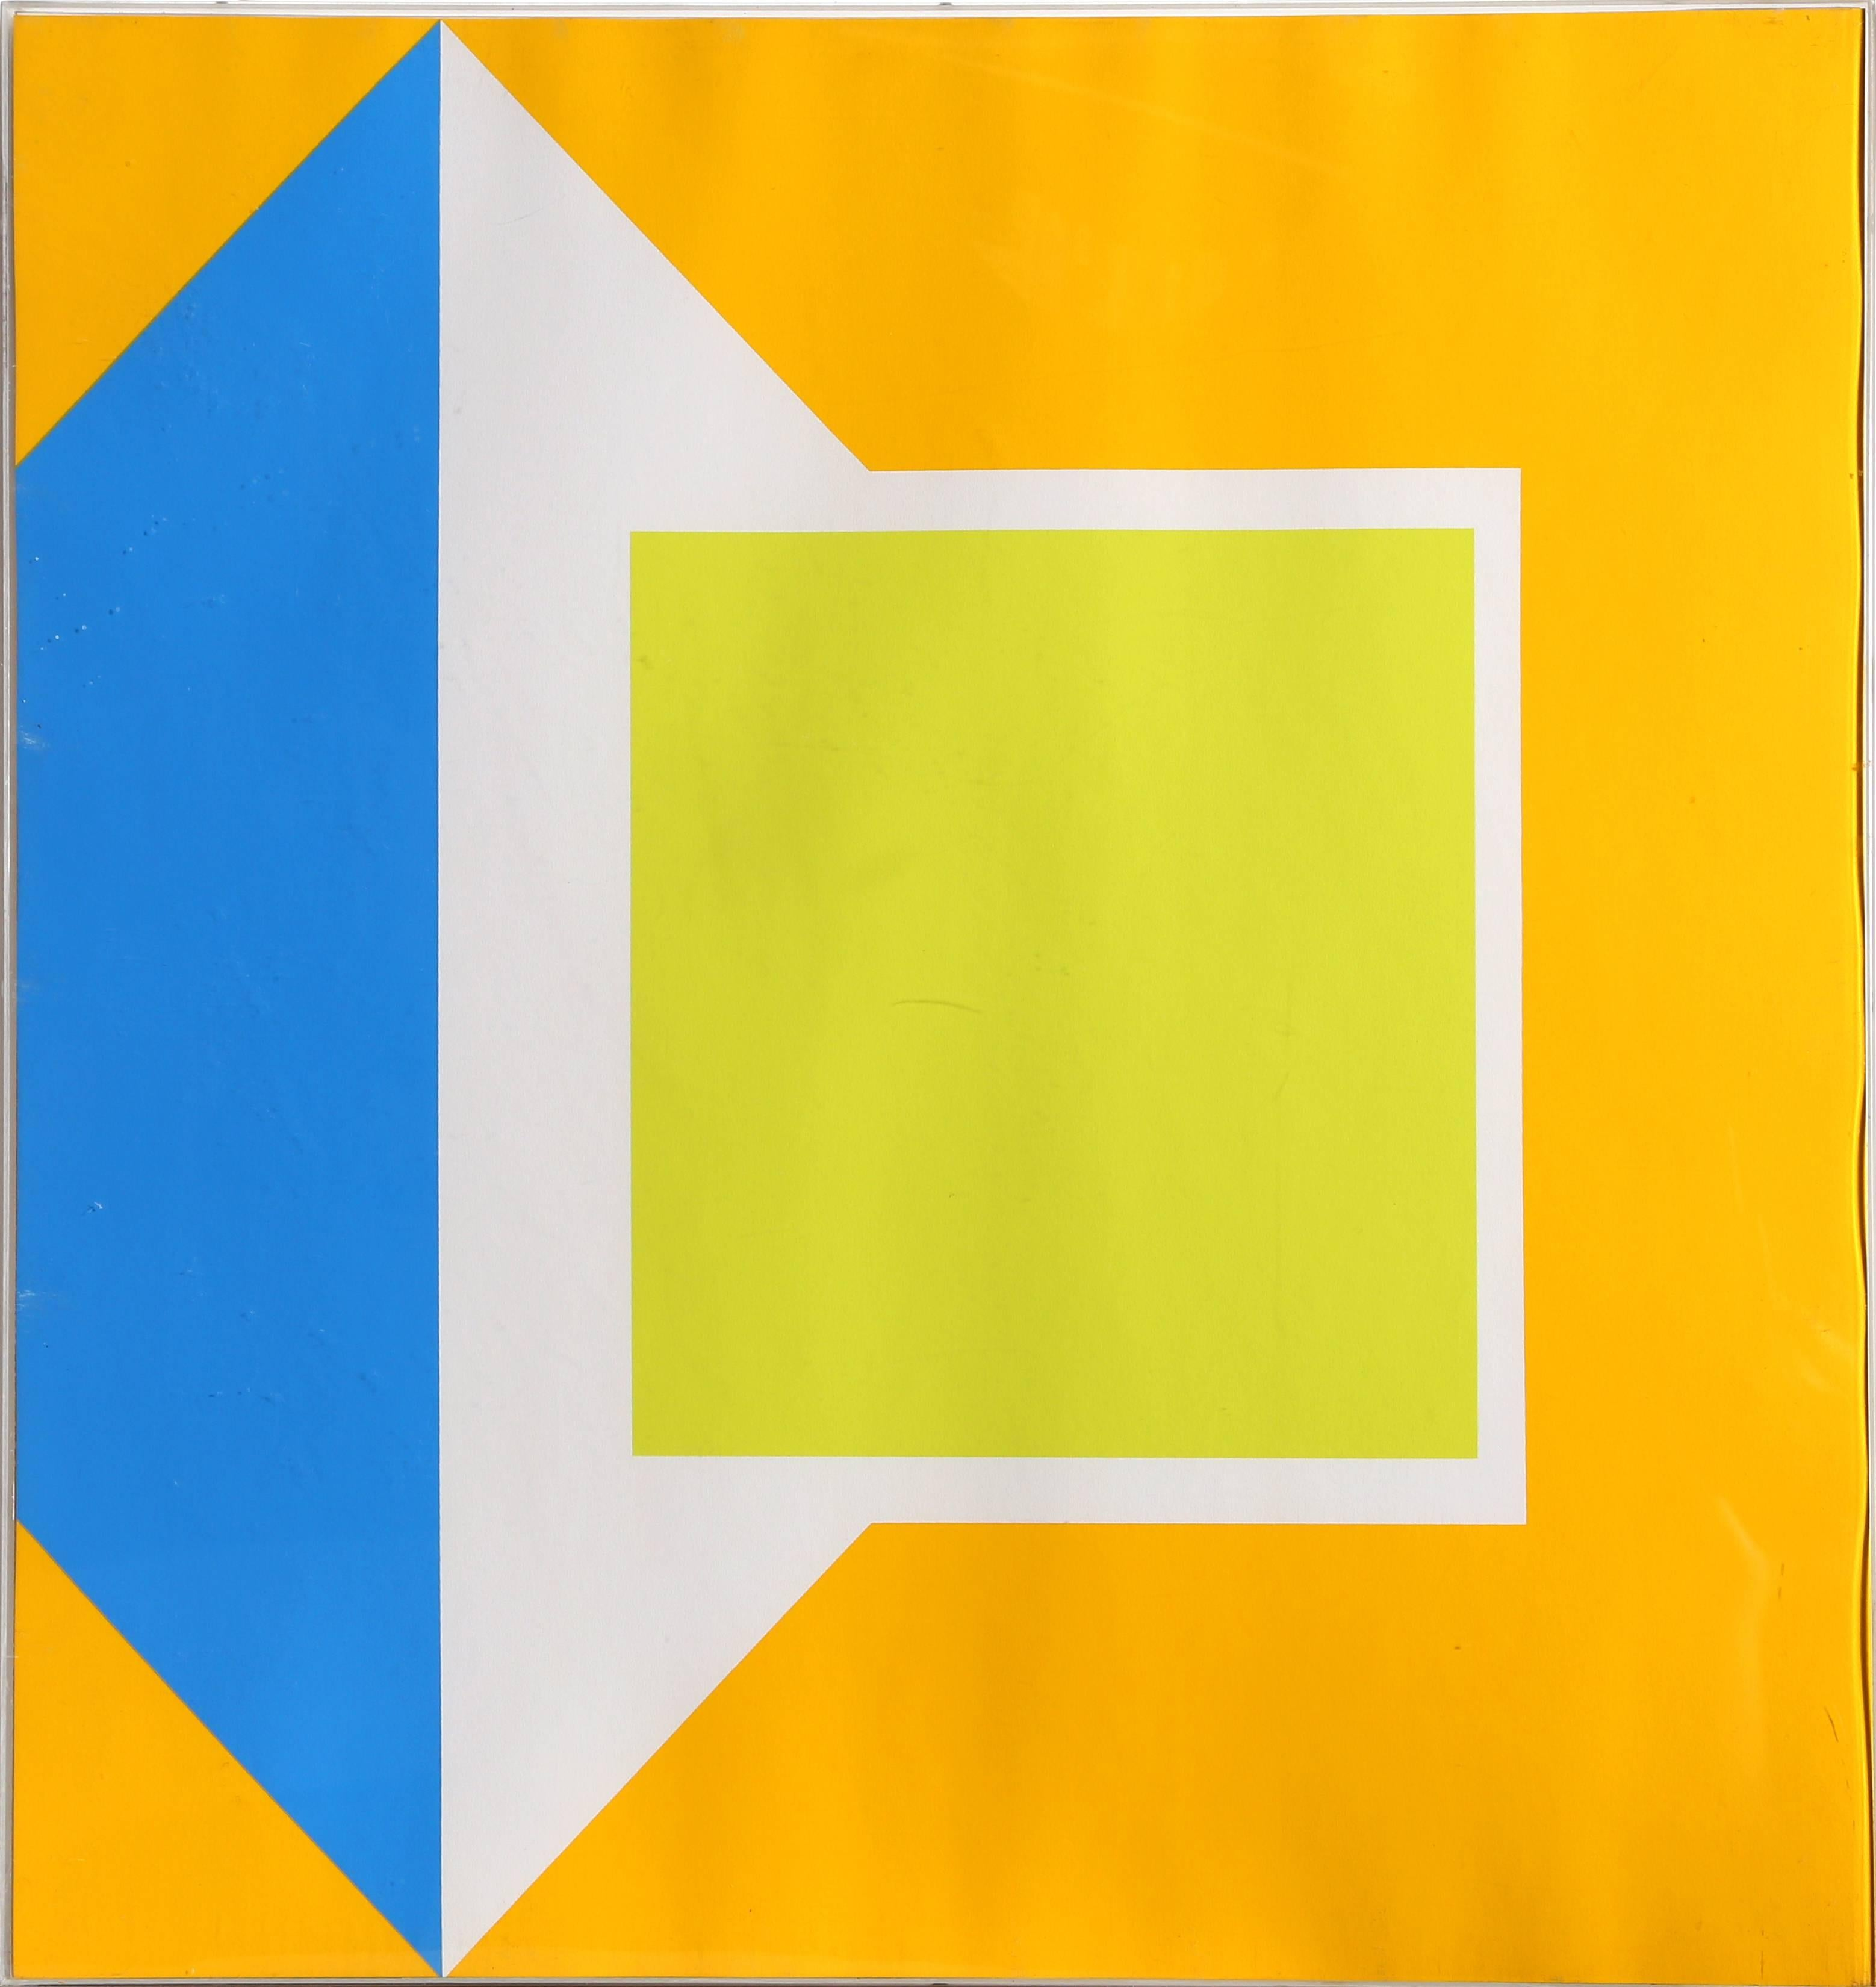 Neun Sergraphien 1, Silkscreen by Georg Karl Pfahler